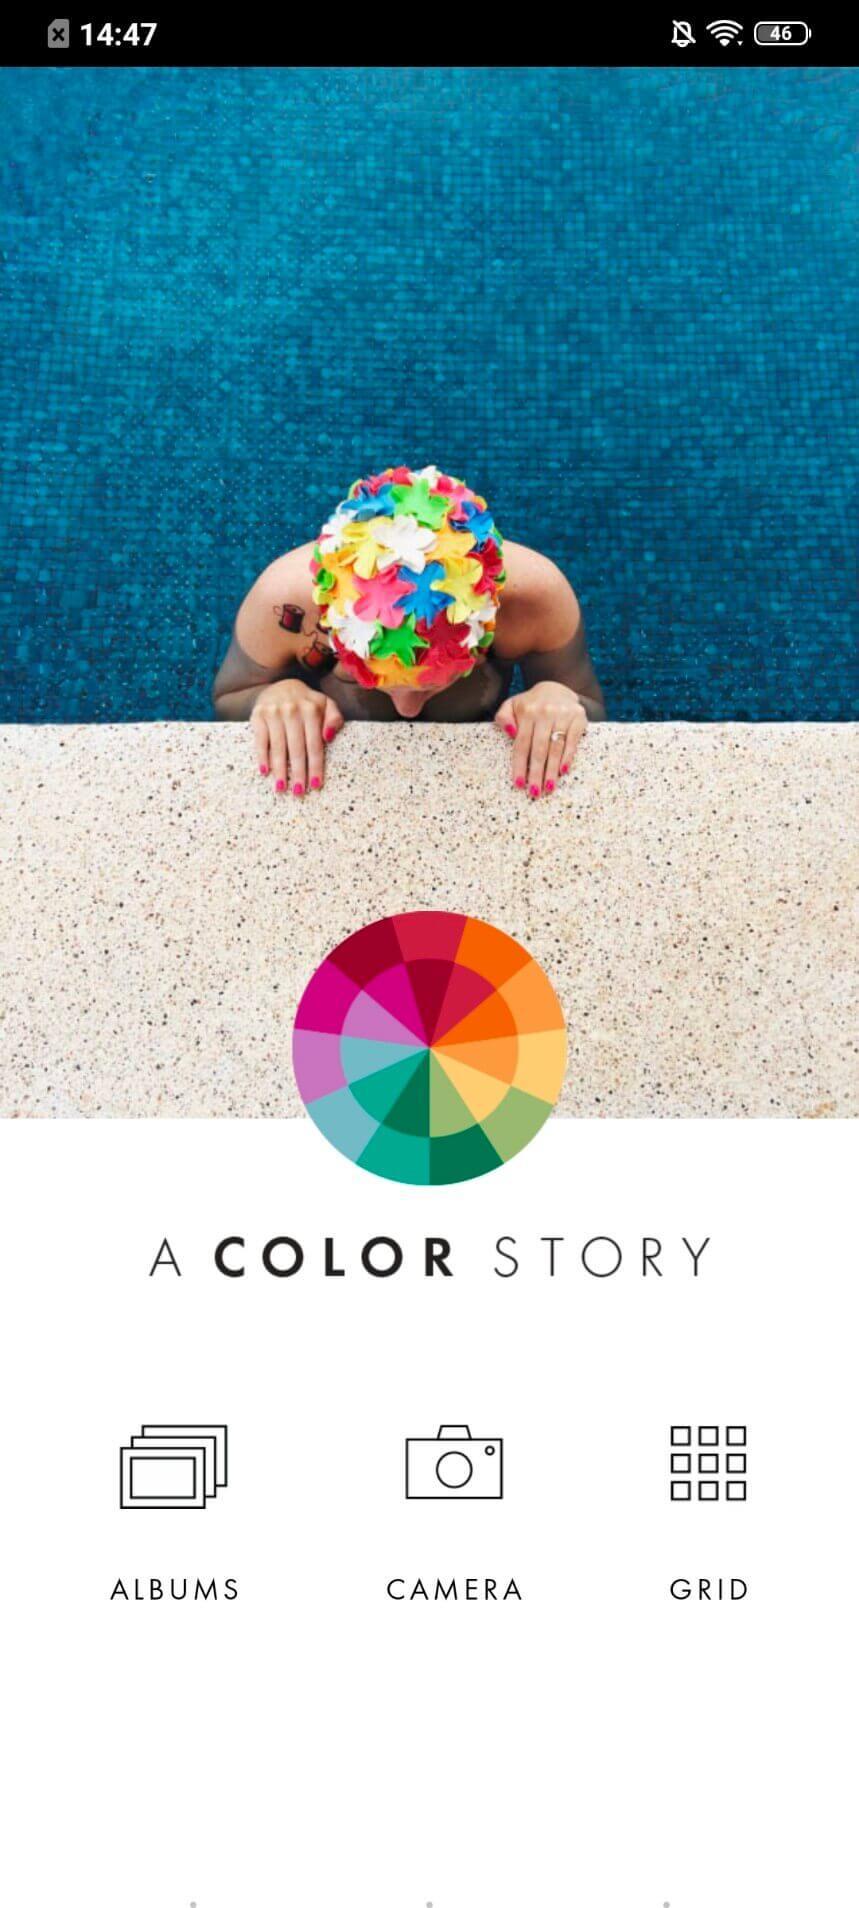 App chỉnh màu đẹp: A Color Story